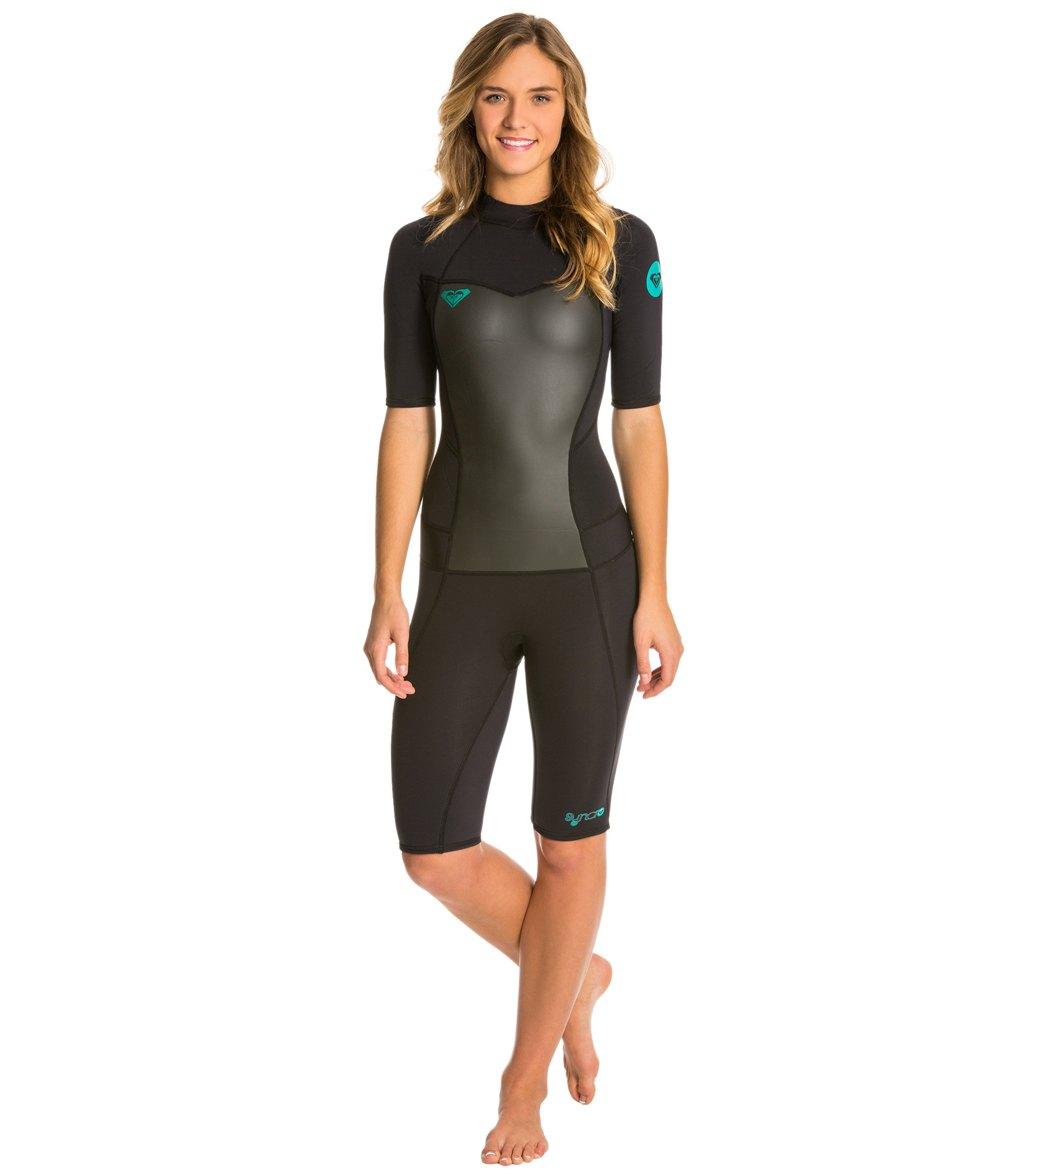 ... Women s 2MM Syncro Short Sleeve Back Zip Spring Suit Wetsuit Play  Video. MODEL MEASUREMENTS 73f61af39